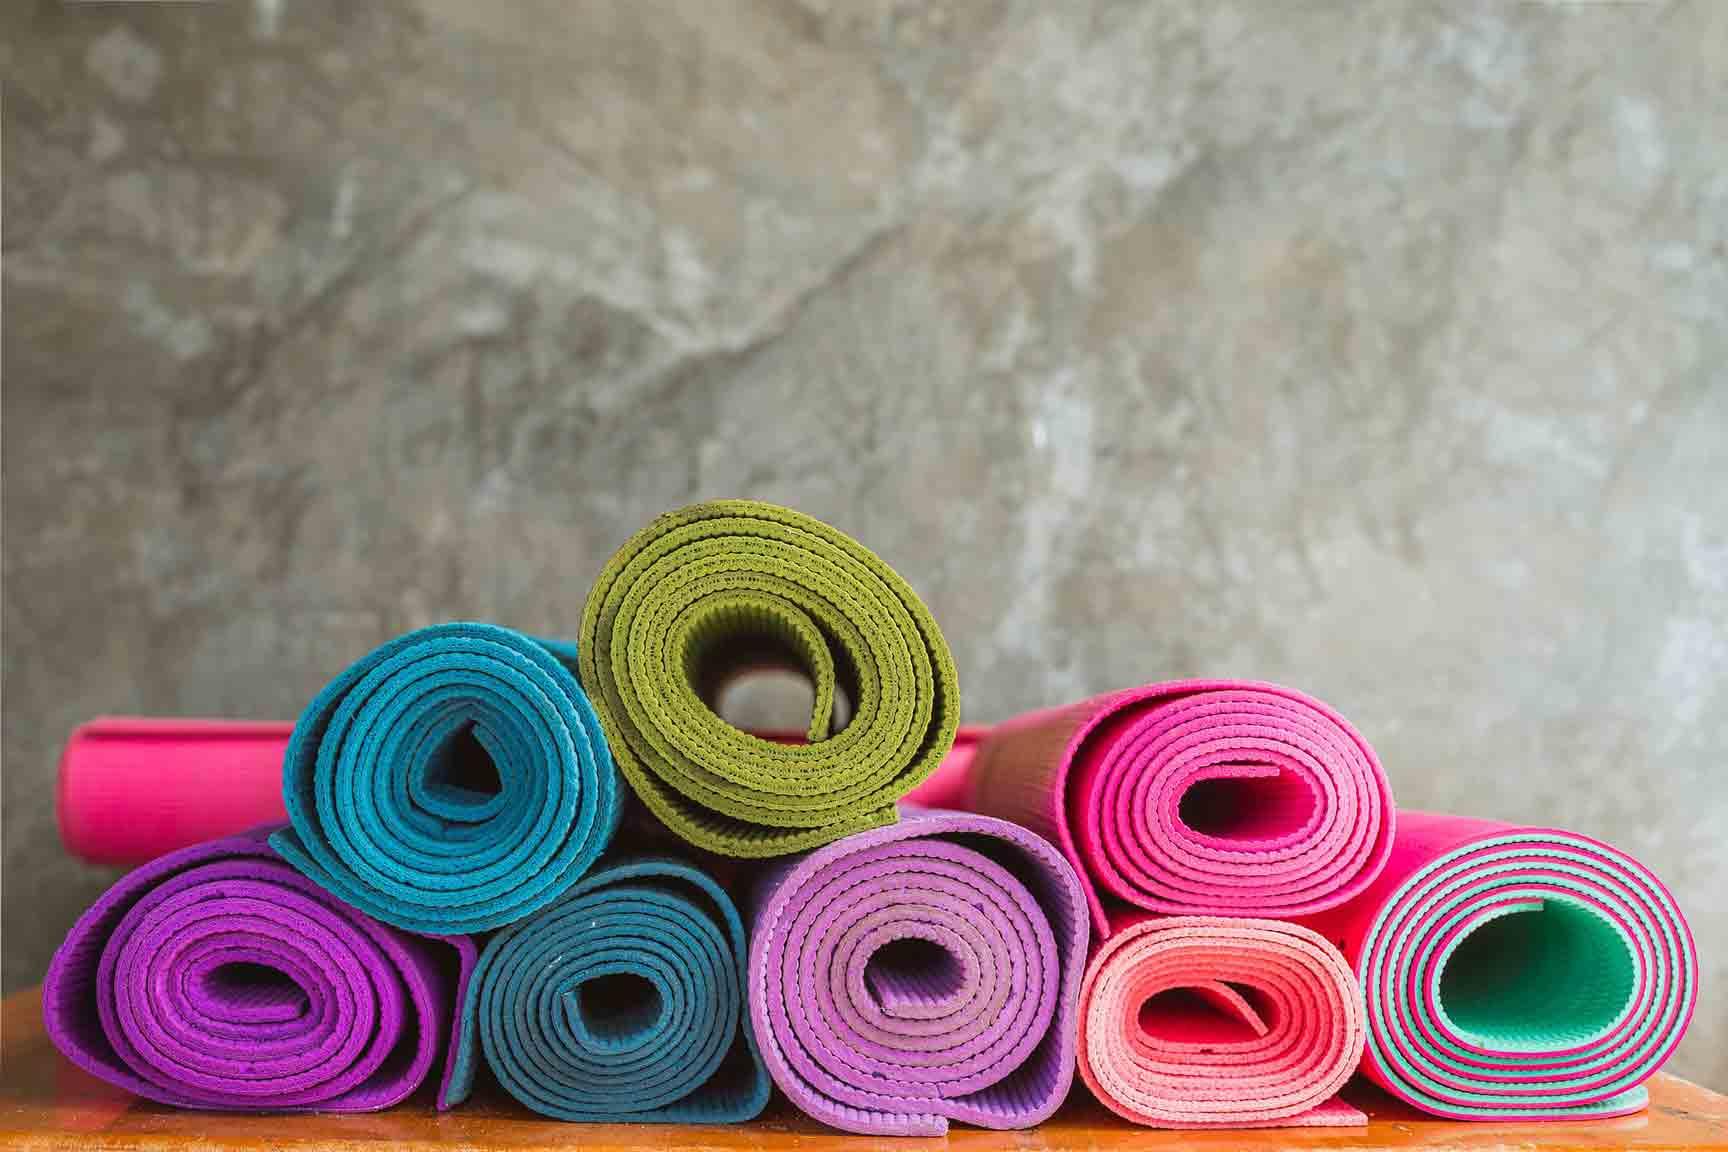 Corona-Fall im Yogastudio: Was ist zu tun?